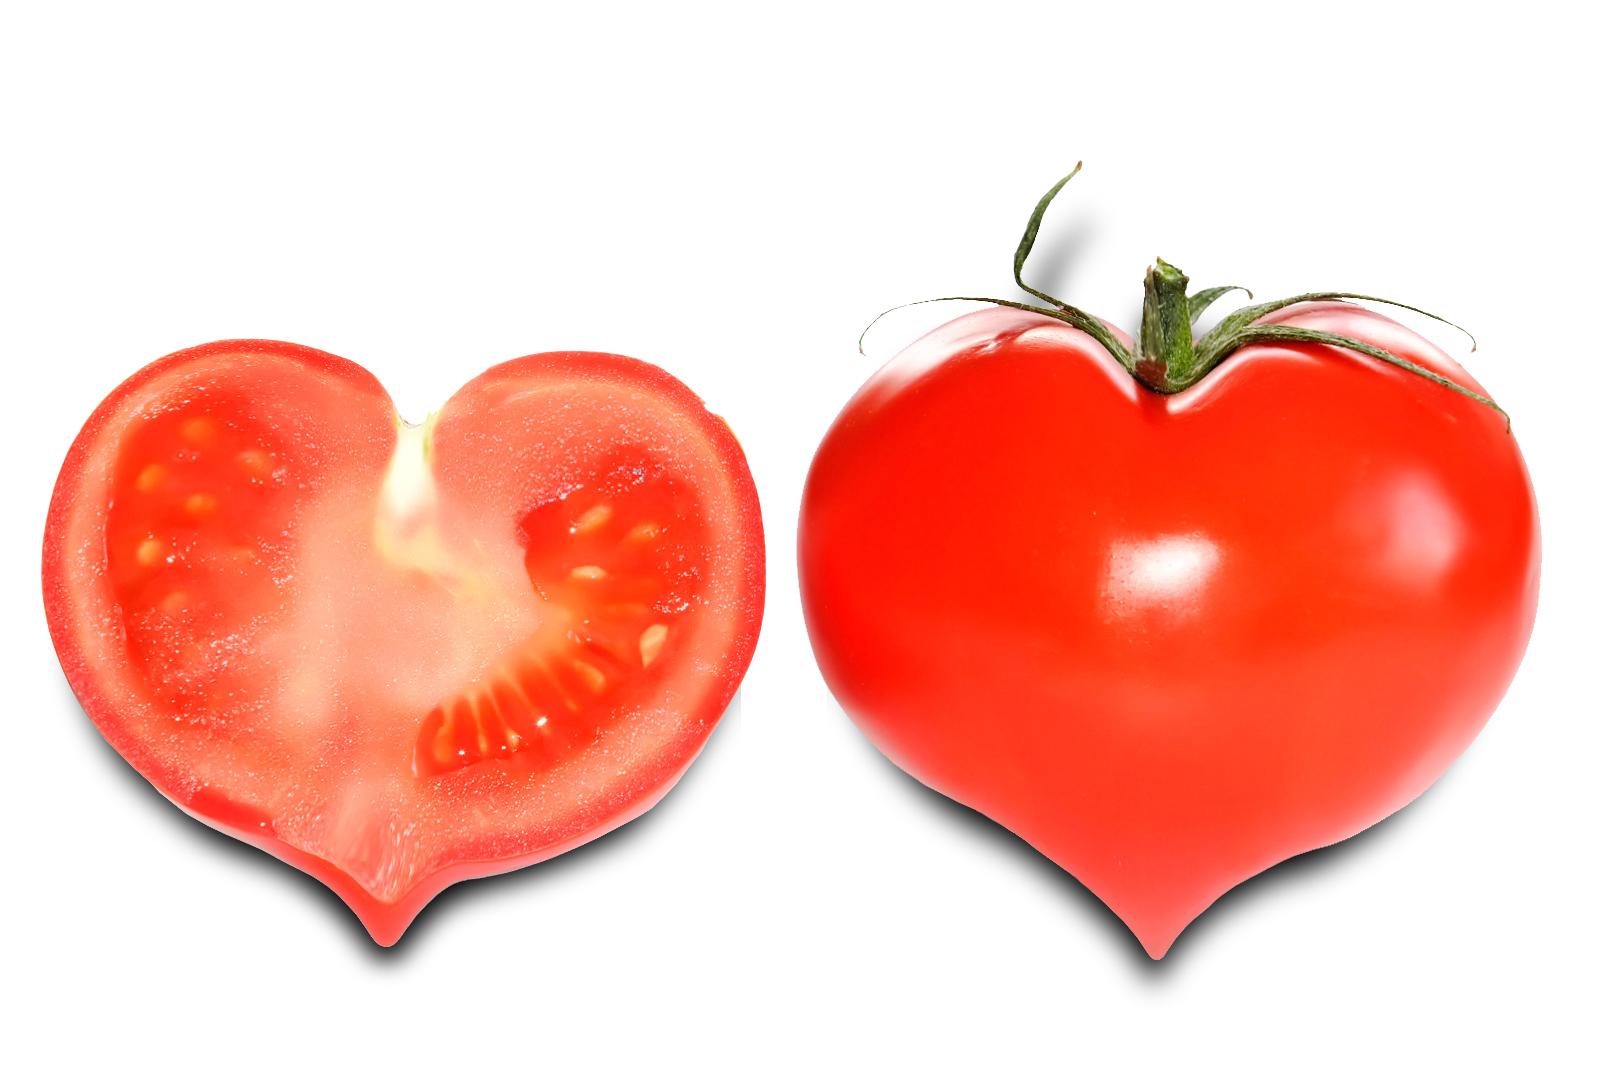 Eating Eden - Our Blog...